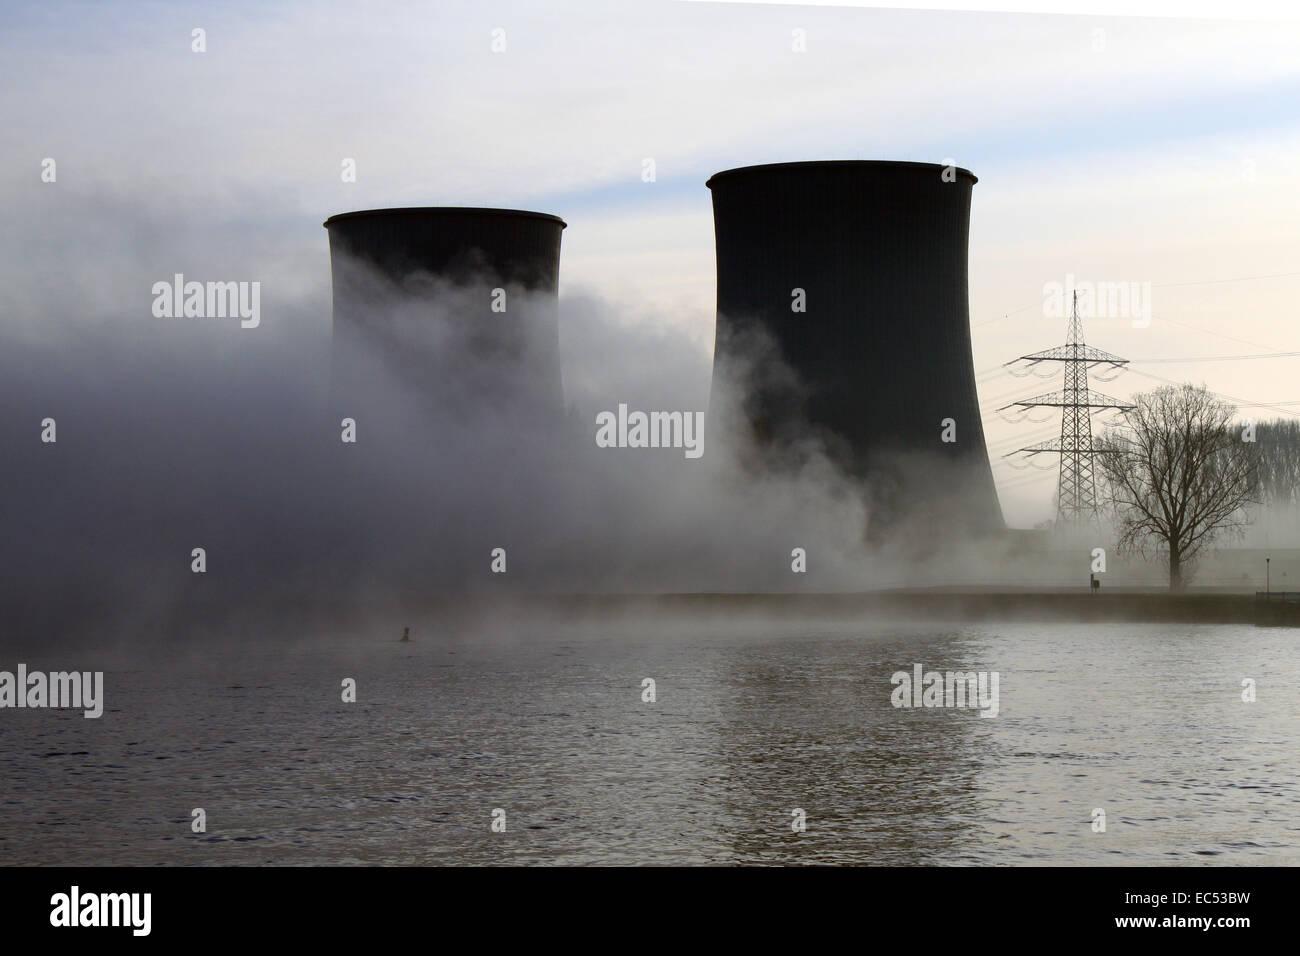 atomkraftwerk in the fog - Stock Image